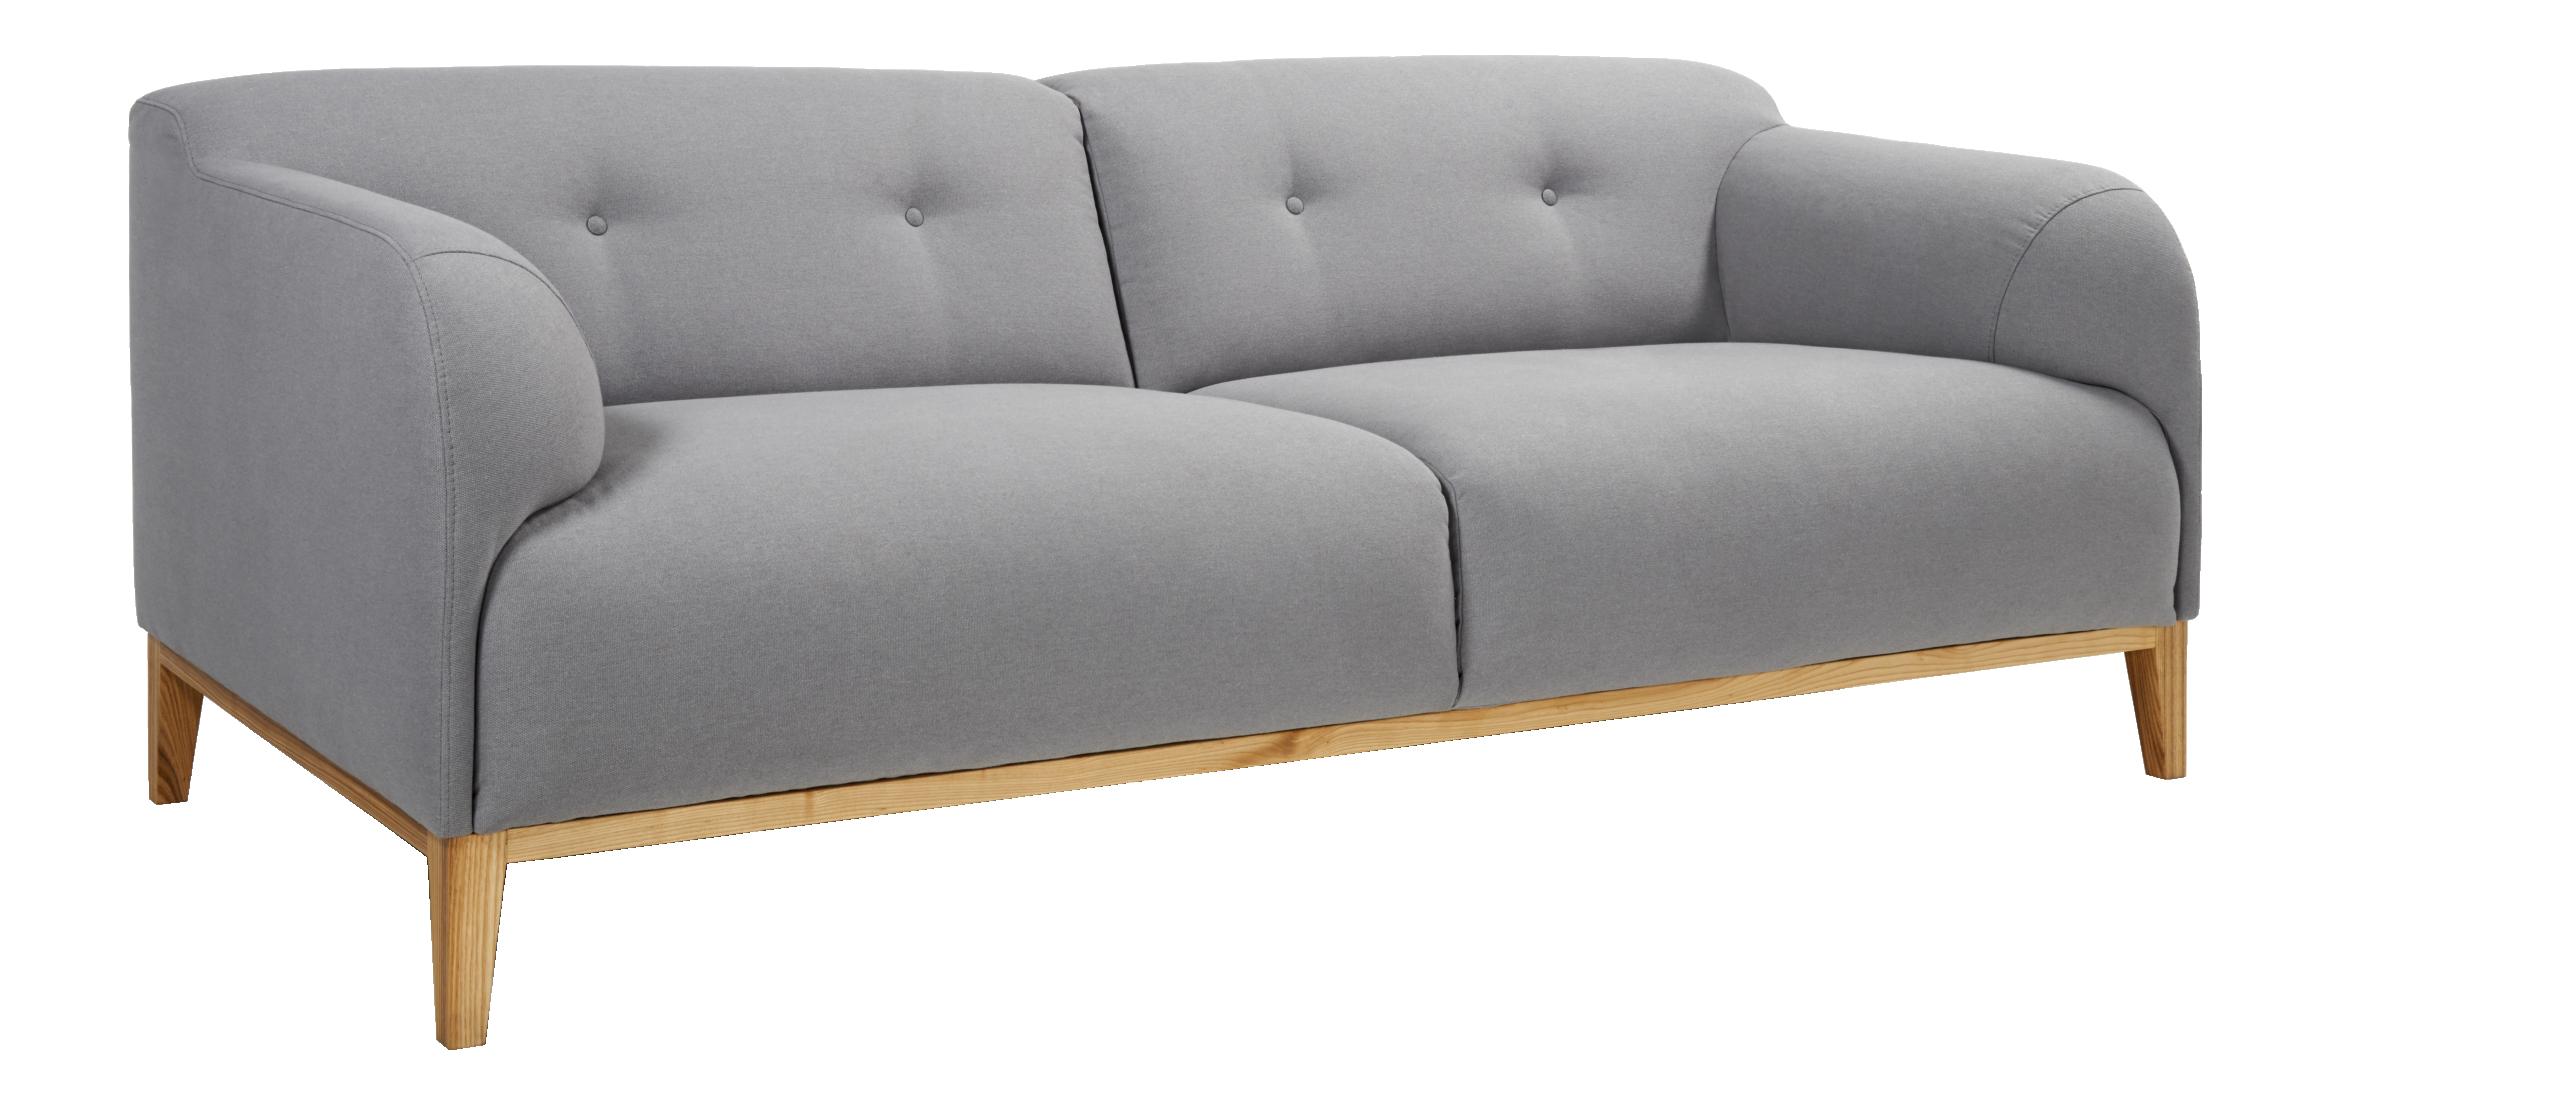 Honore 3st Sofa Light Grey 1 270311 Png 2560 1106